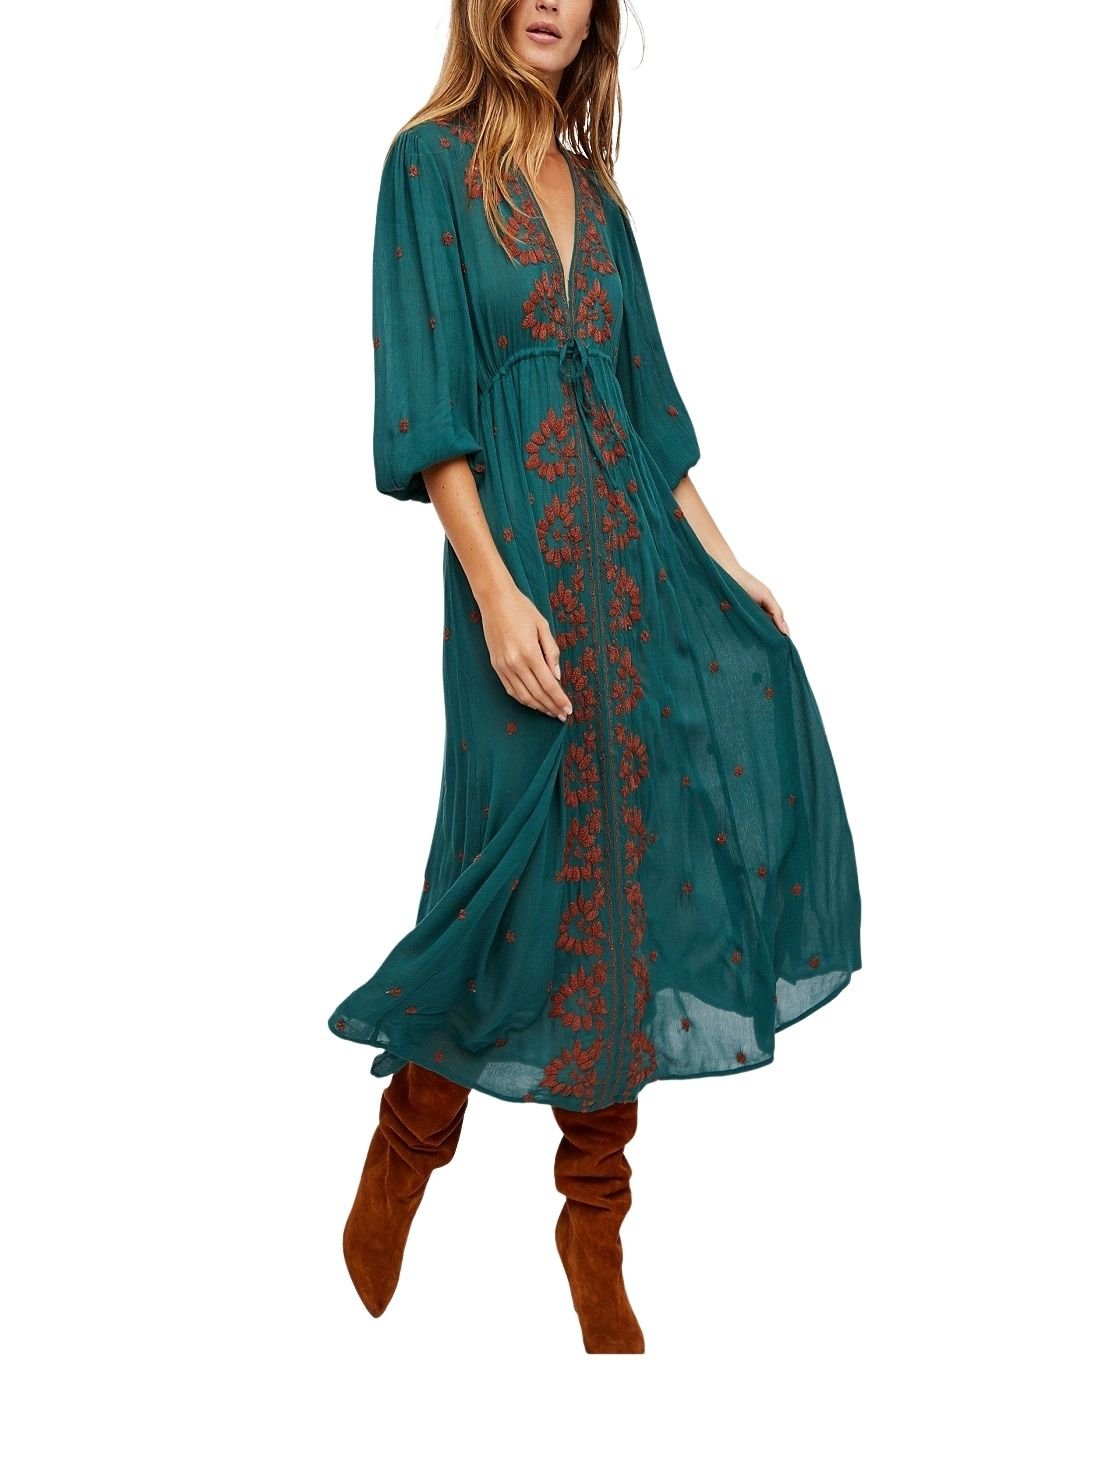 Wholesale Embroidered Fable Midi Boho Dress